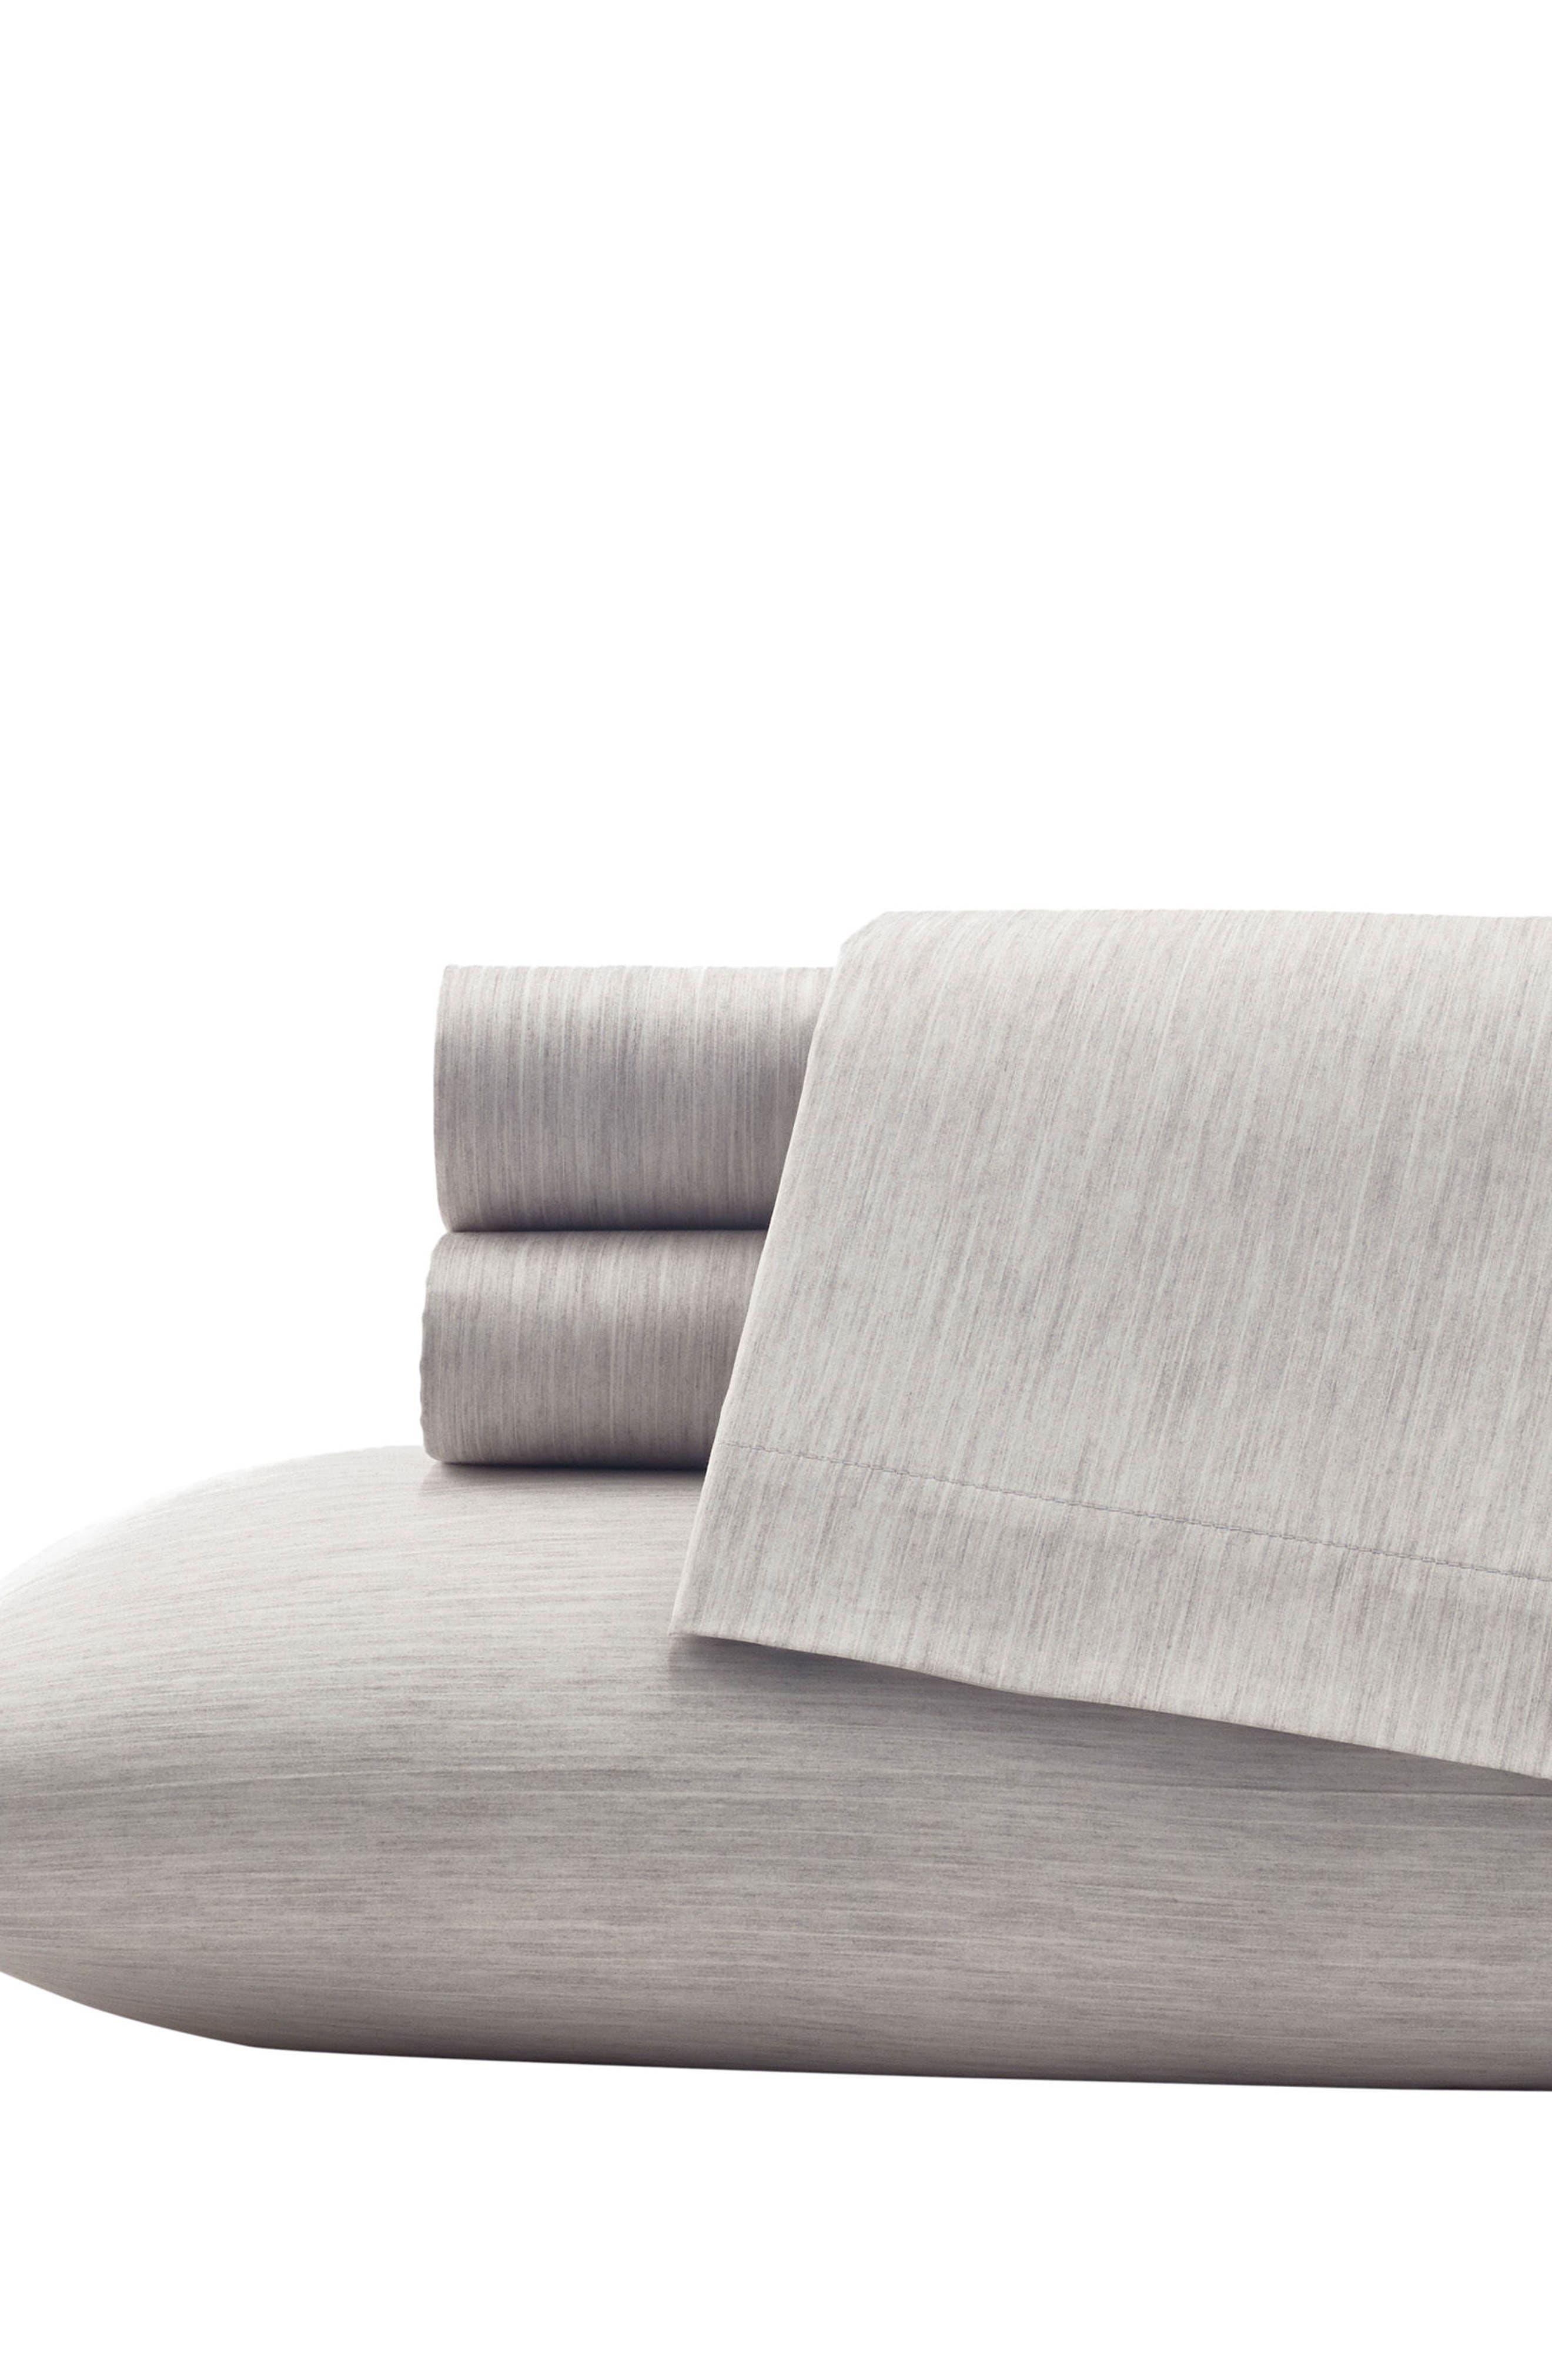 Main Image - Vera Wang Marble Shibori 300 Thread Count Pillowcases